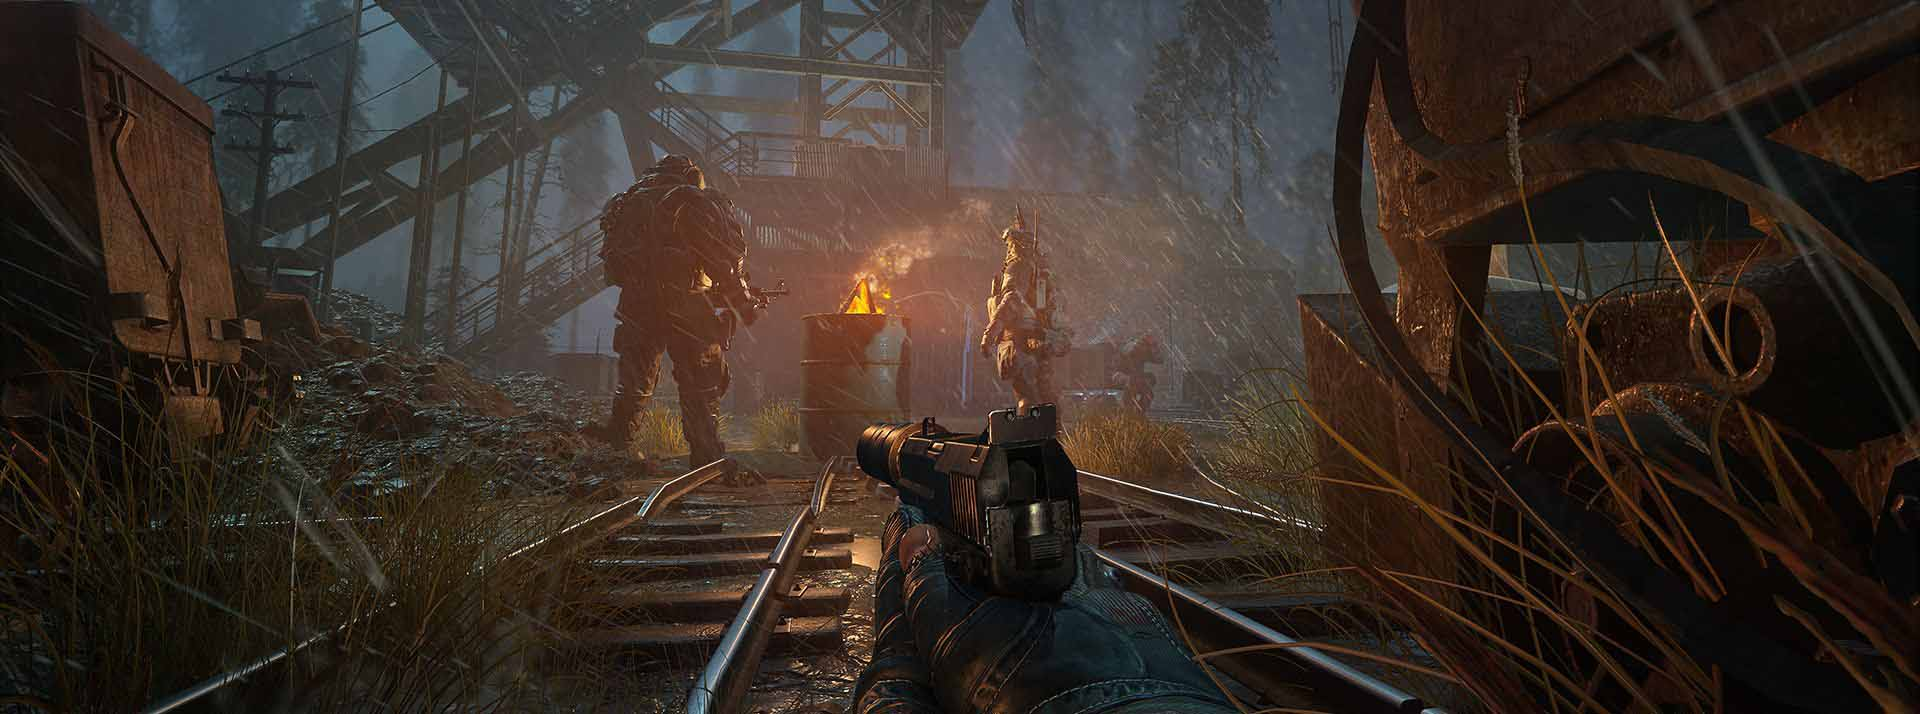 Review: Sniper: Ghost Warrior 3 - Slant Magazine